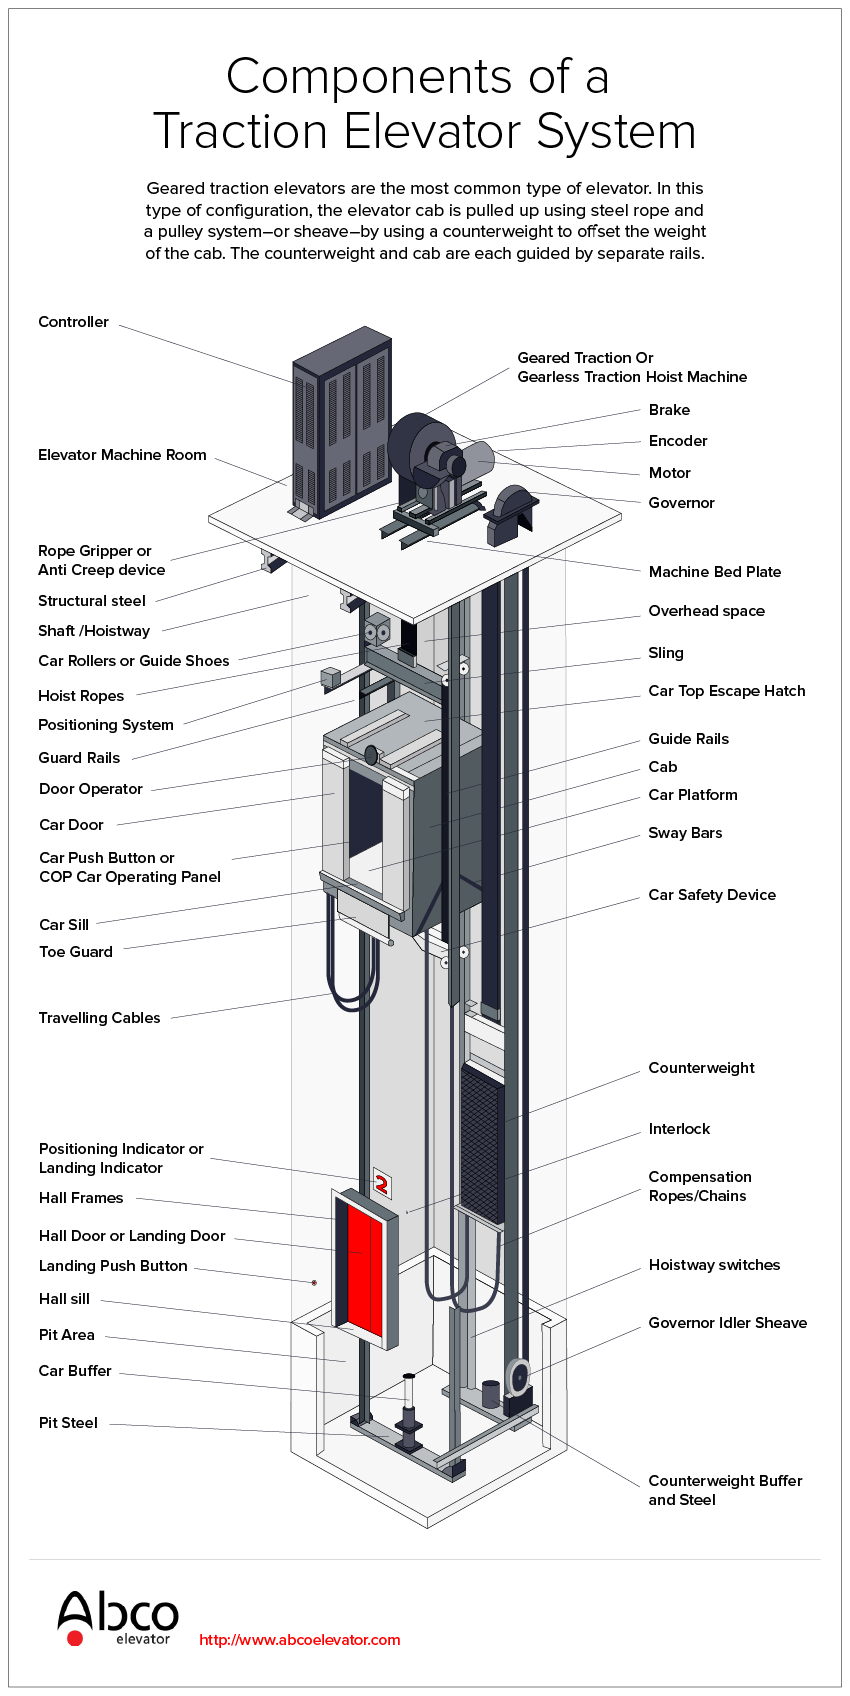 Traction Elevators 101 Abco Elevator